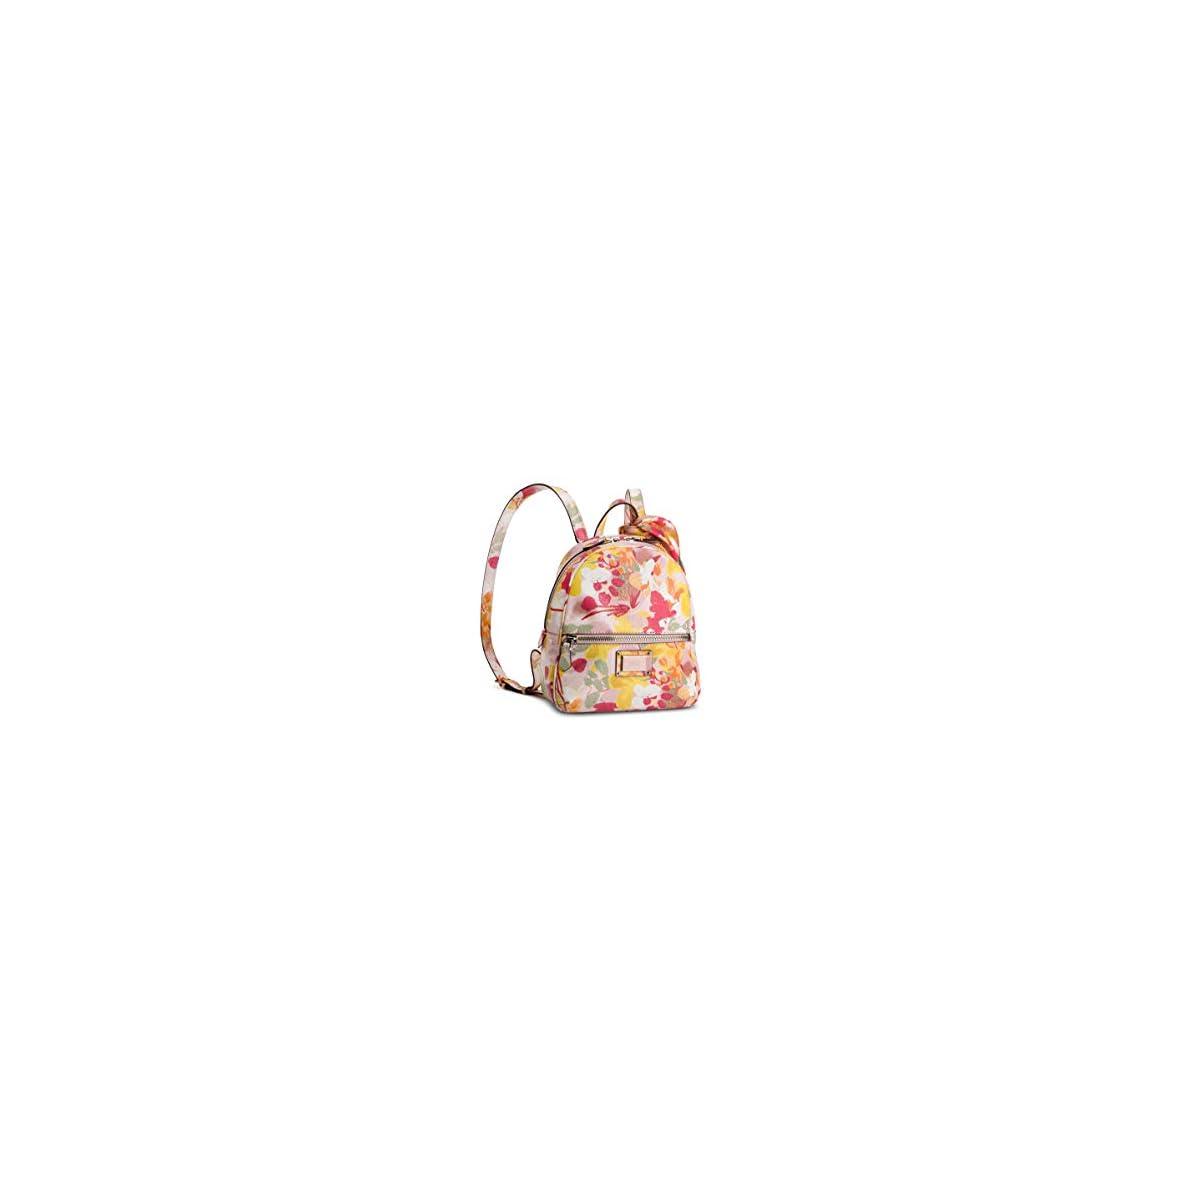 318DKFpi%2BYL. SS1200  - Guess Shannon Backpack - Mochilas Mujer